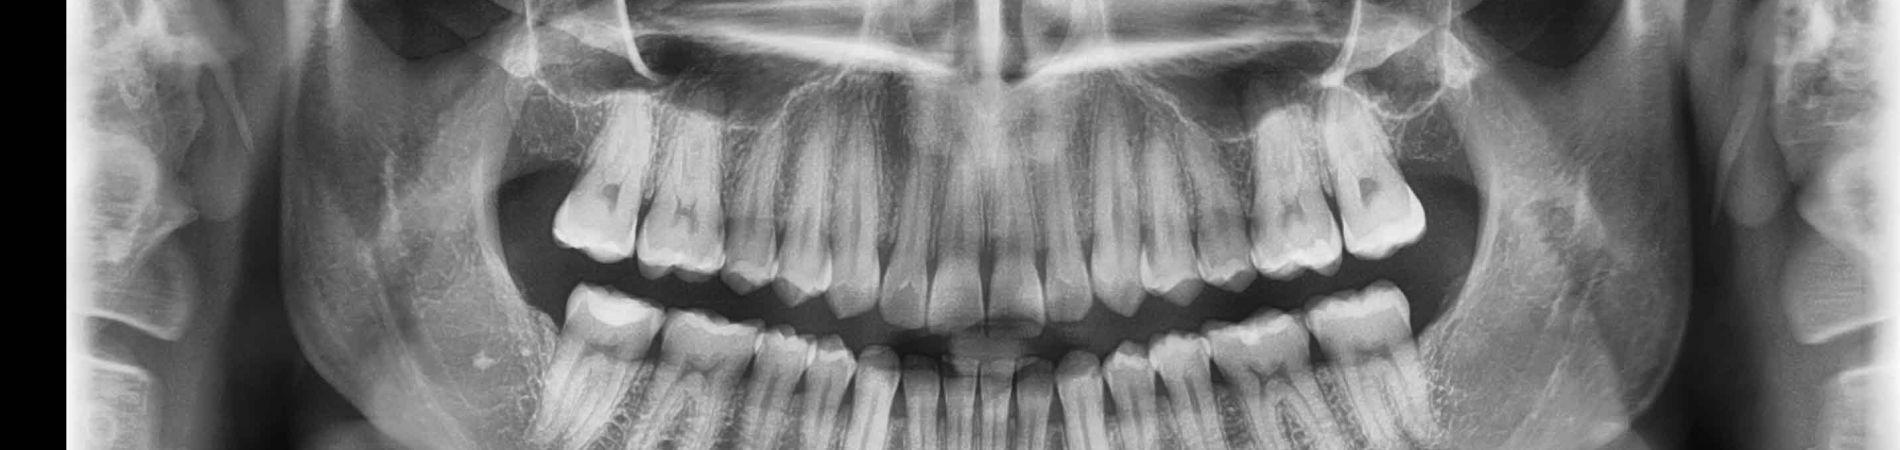 panoramic x-ray, radiograph